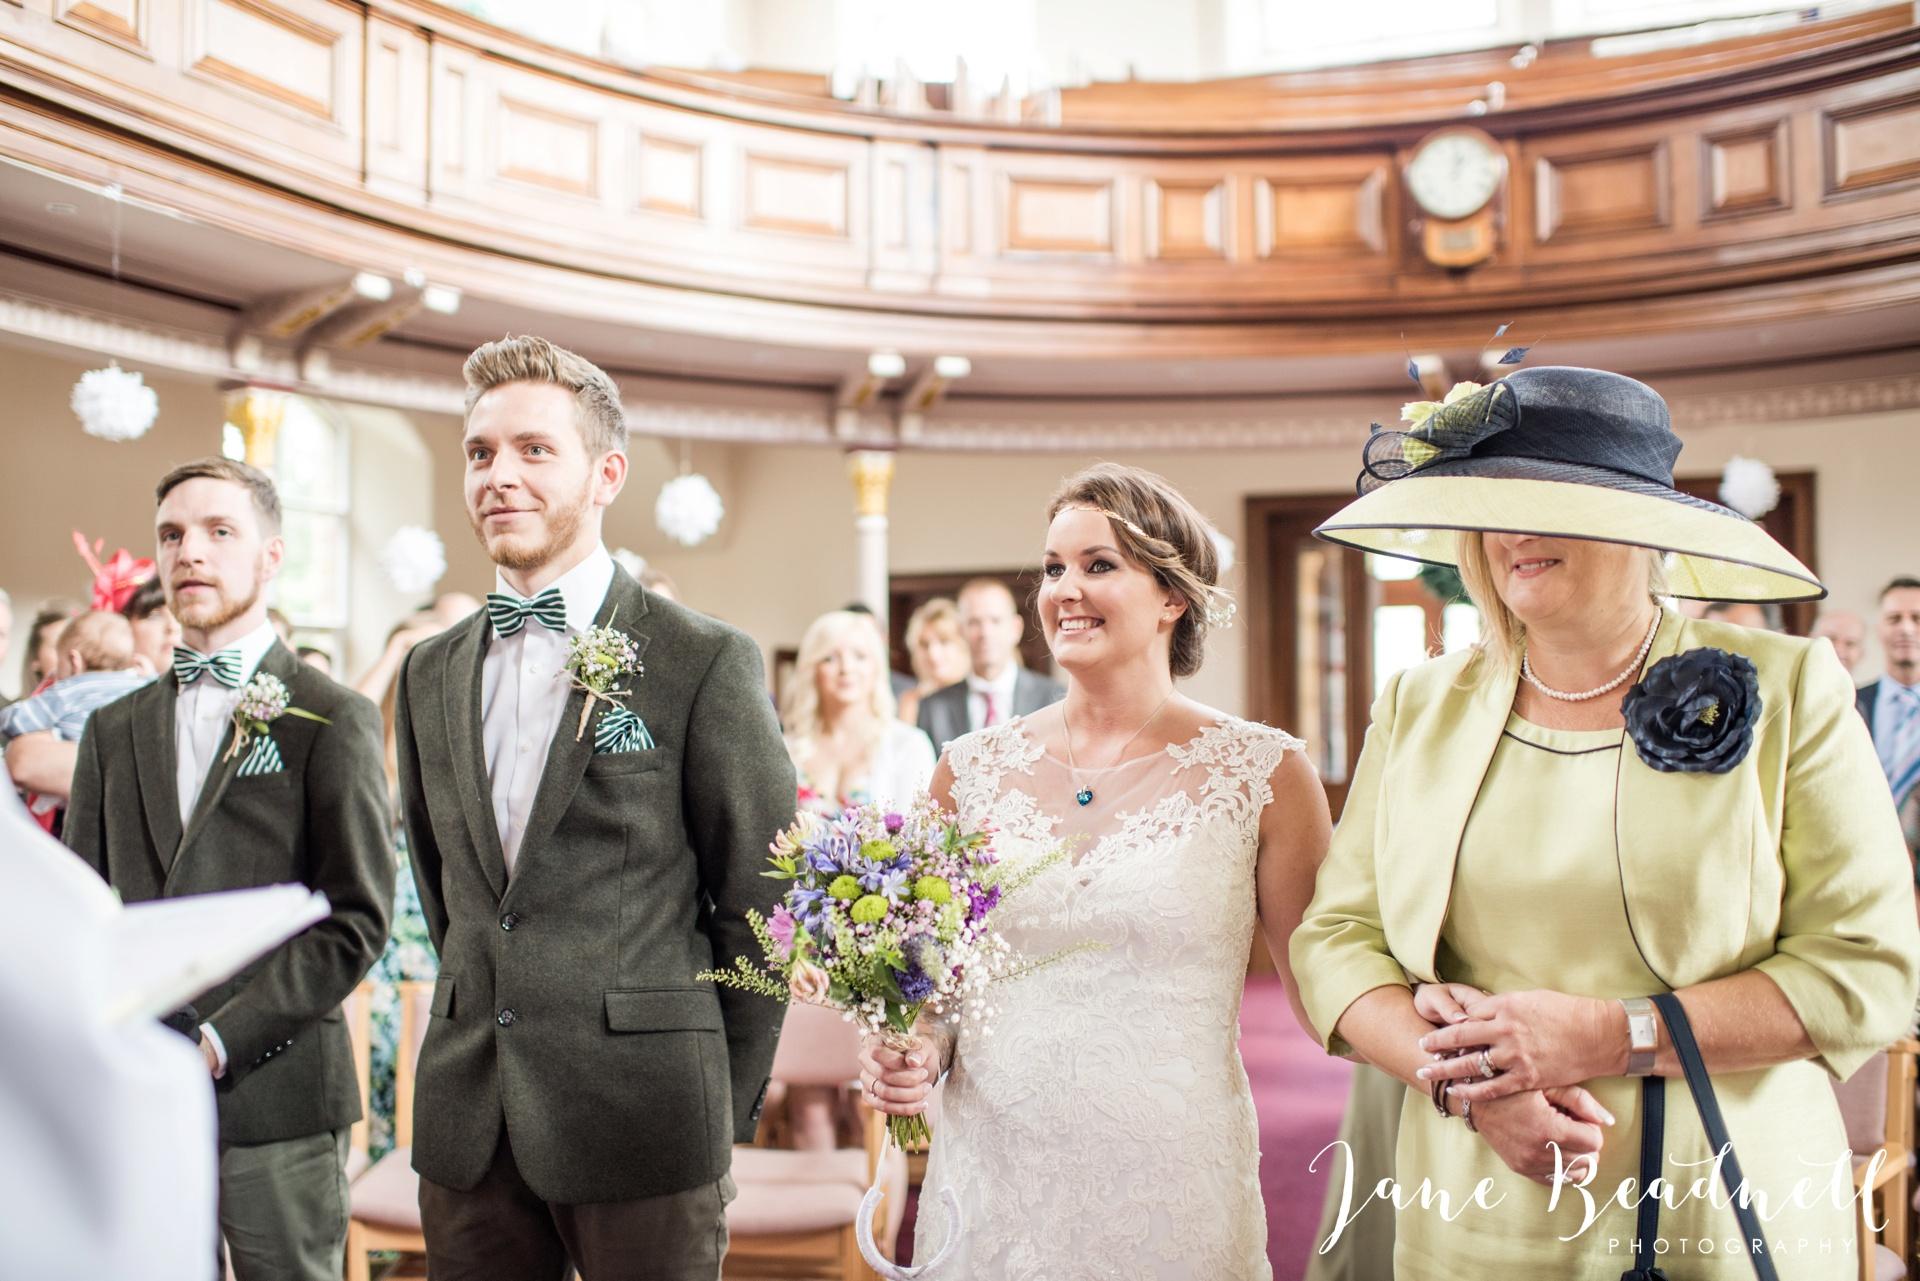 Jane Beadnell fine art wedding photographer The Old Deanery Ripon_0026